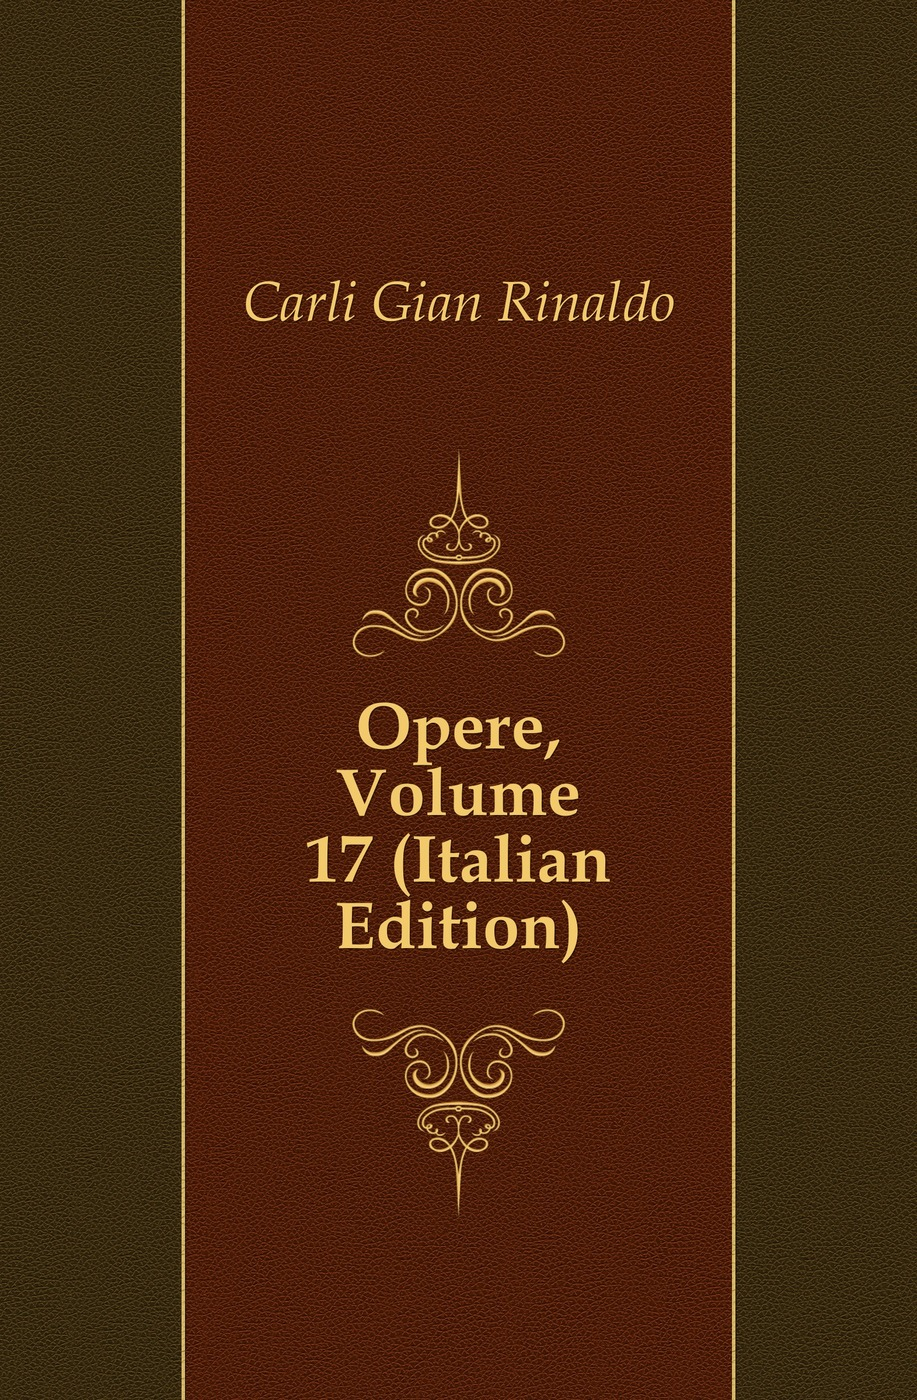 Carli Gian Rinaldo Opere, Volume 17 (Italian Edition)